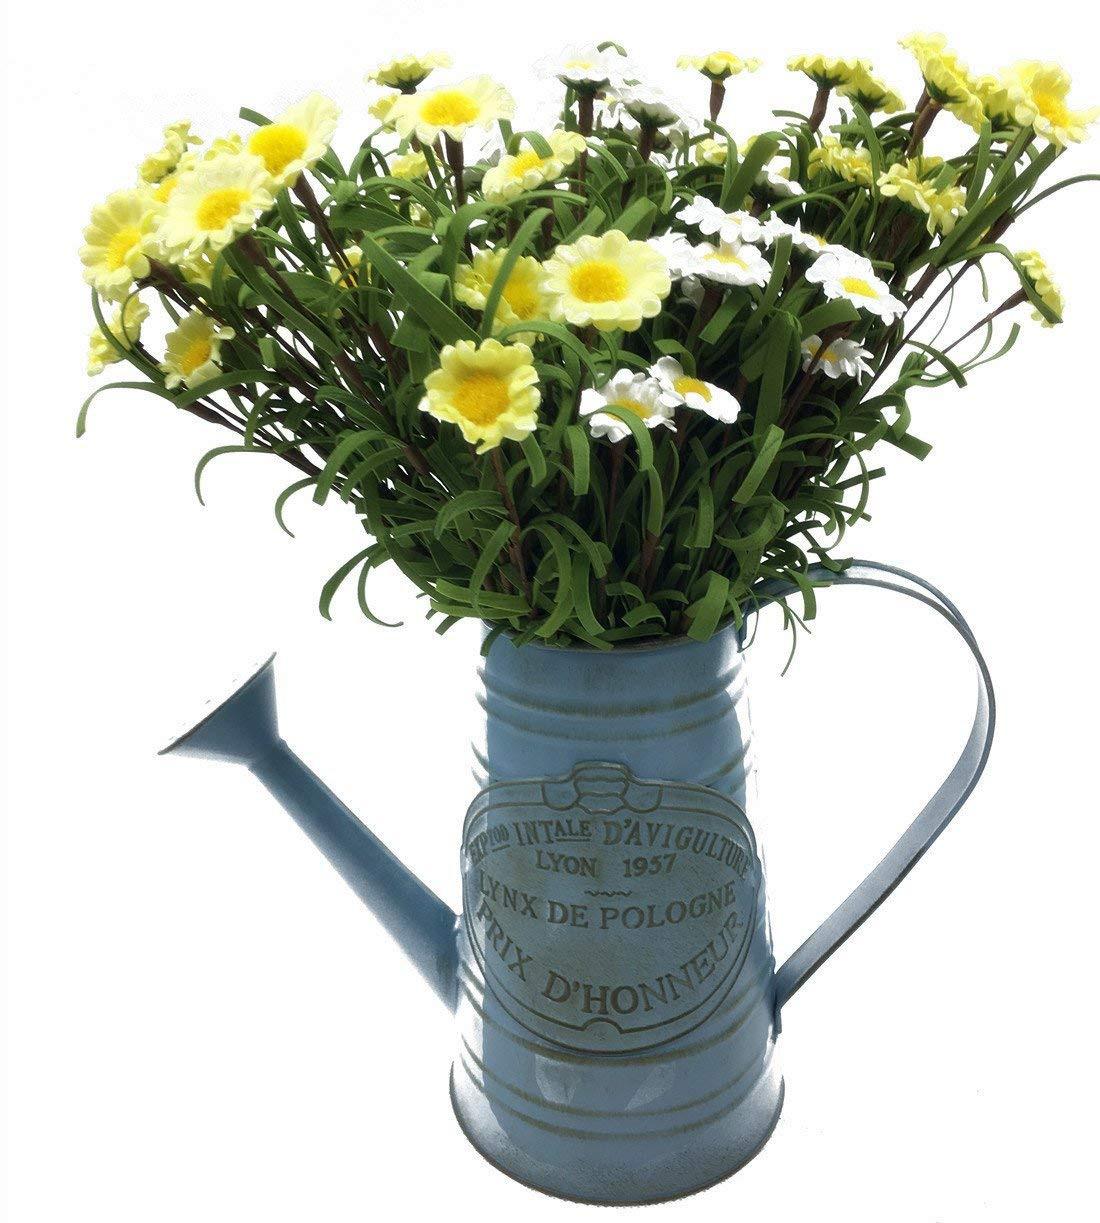 amazon small flower vases of apsoonsell shabby chic metal jug vase flower holder for home within apsoonsell shabby chic metal jug vase flower holder for home decoration amazon ca home kitchen